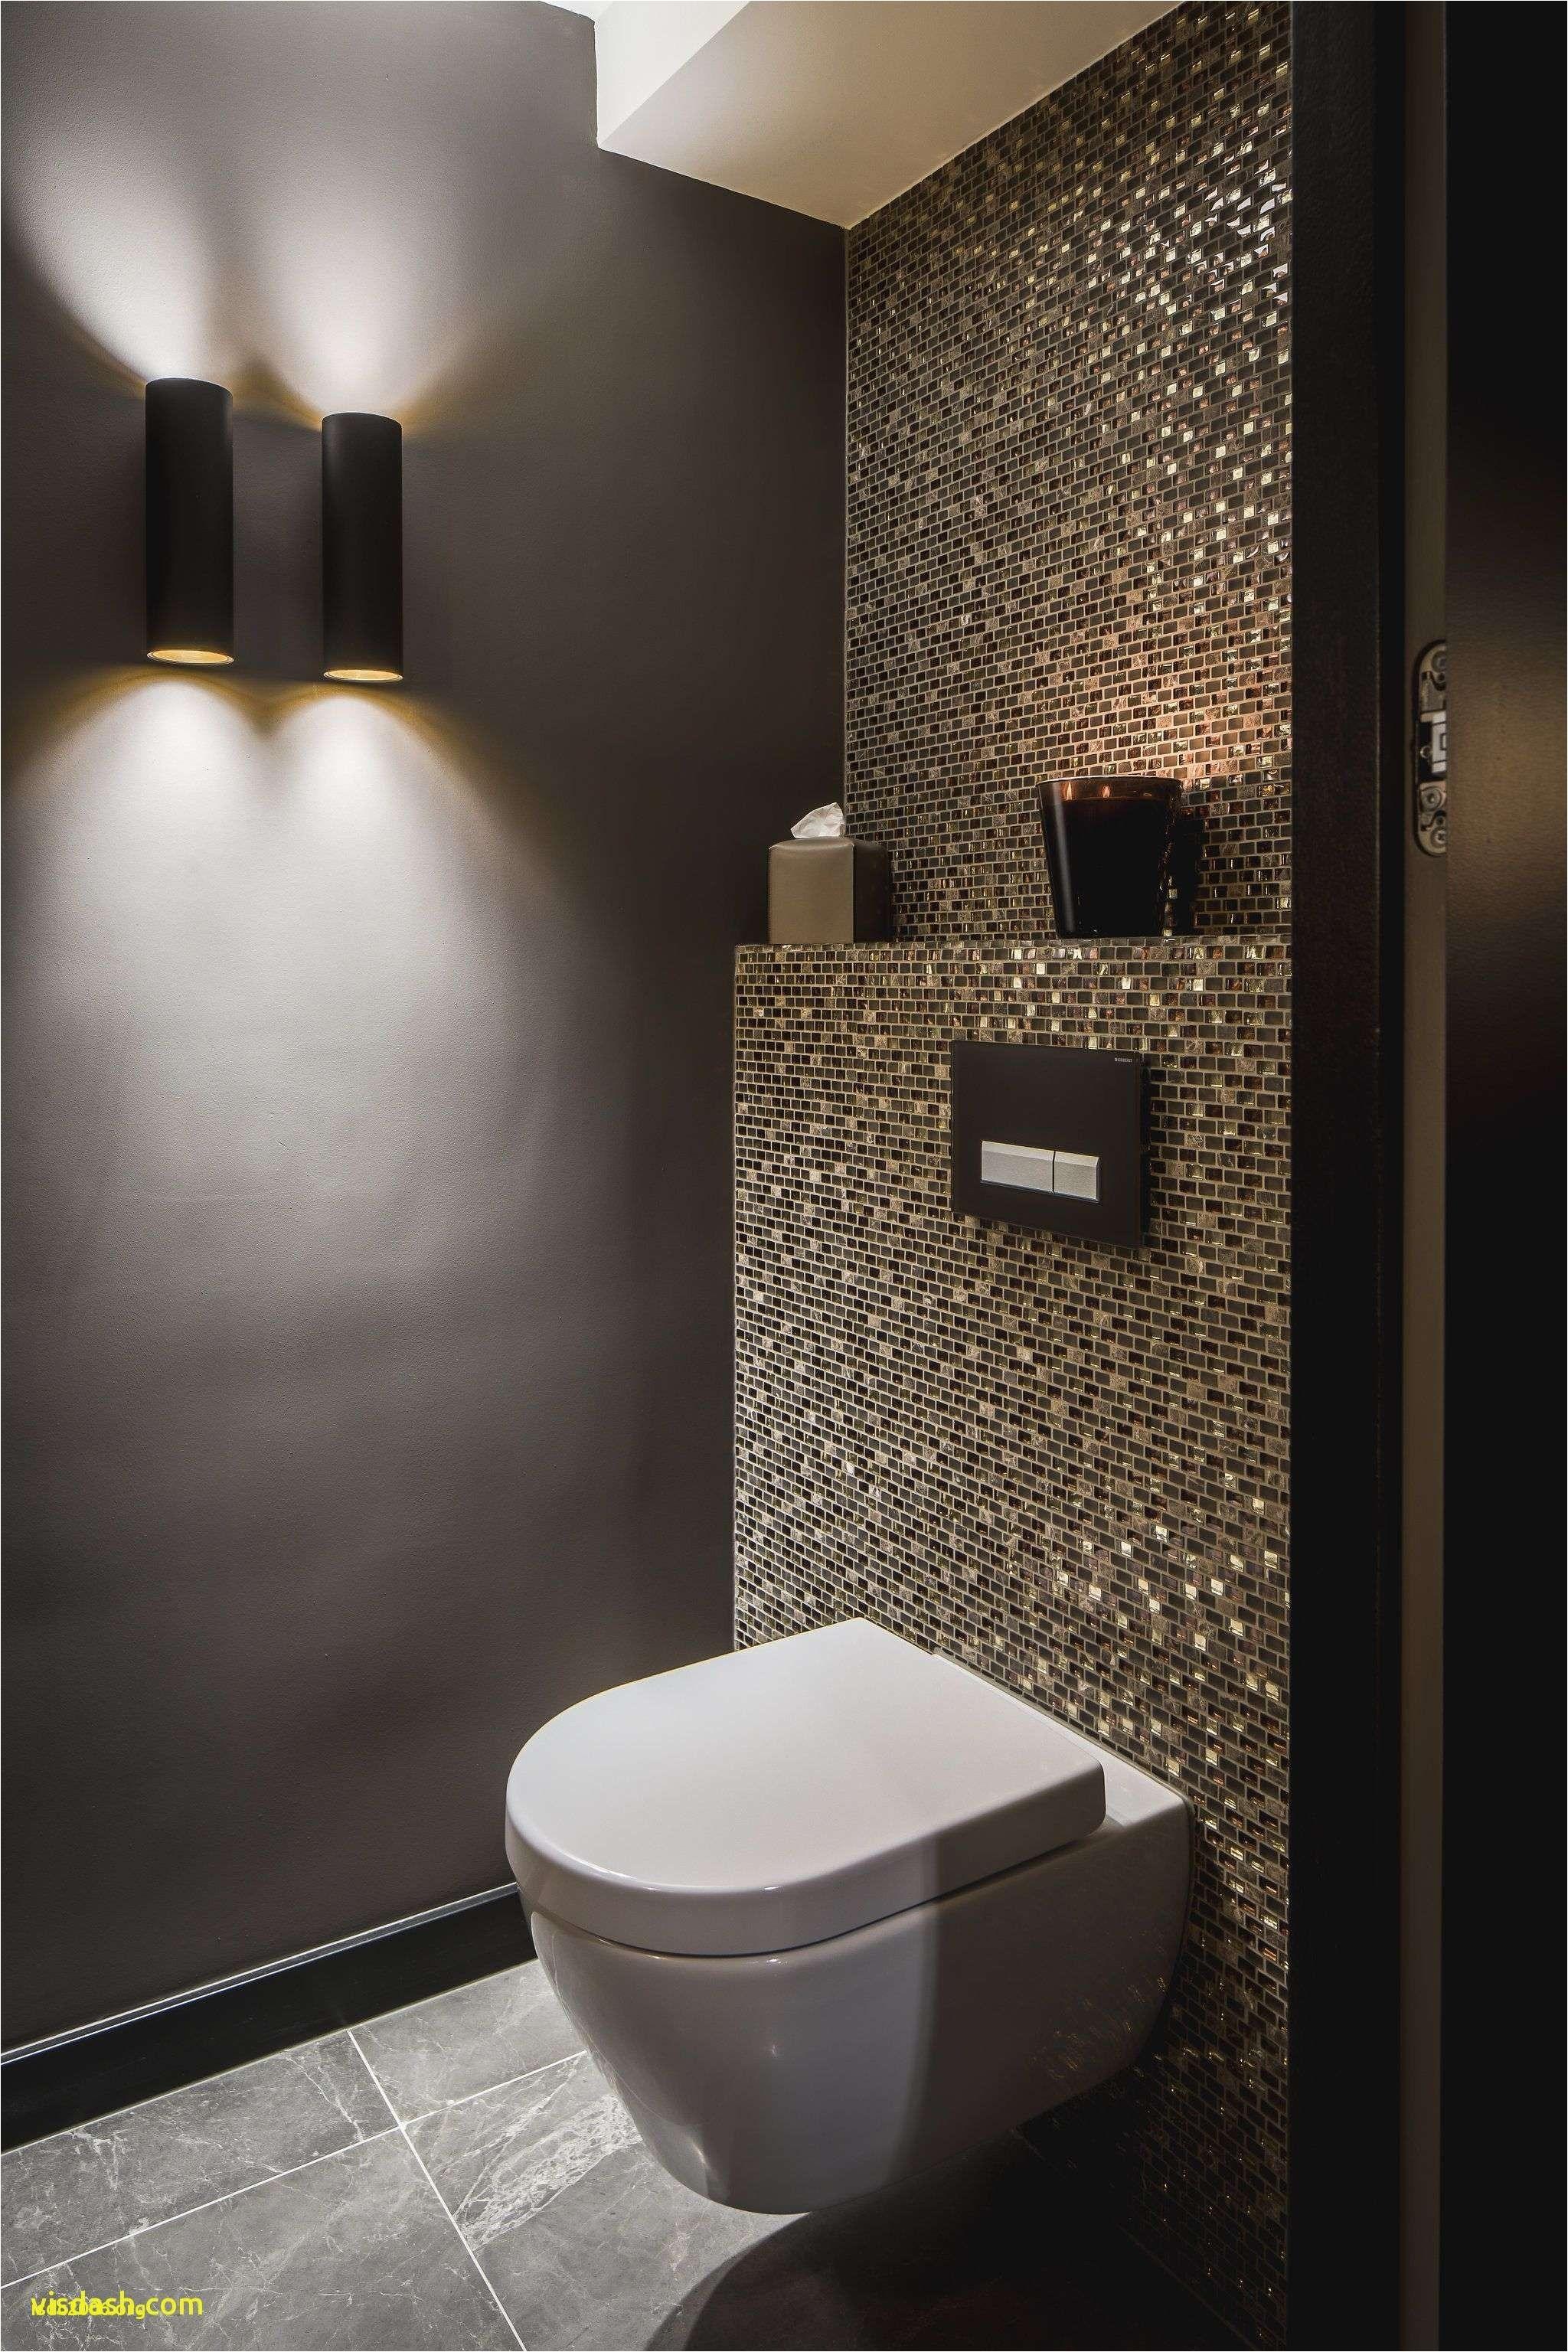 Design Bathroom Lovely E Design Bathroom 0d Design Bathroom Luxury Bathroom 29 Bathroom Design Ideas